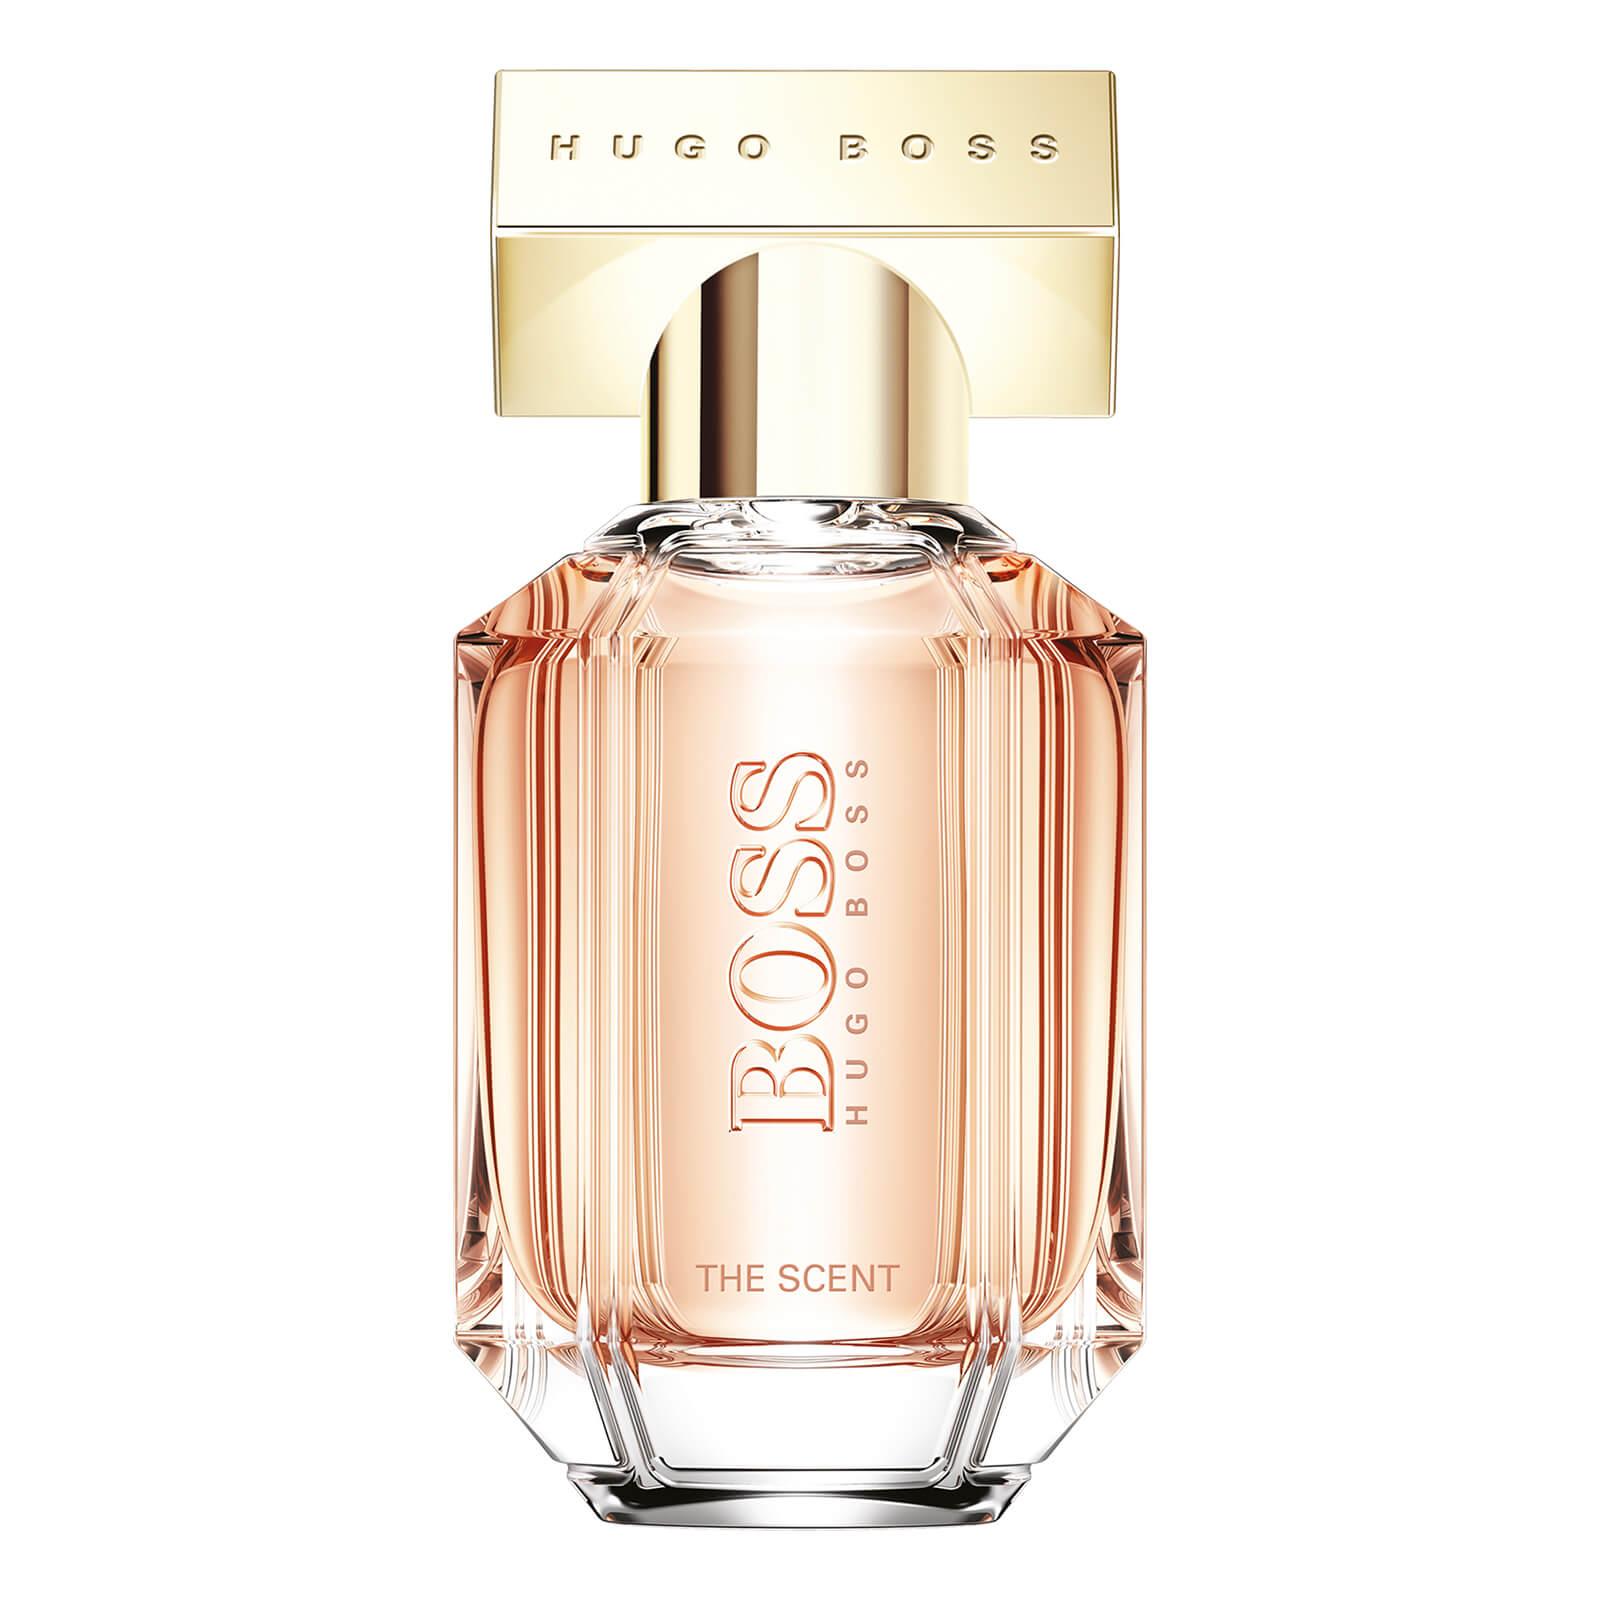 Hugo Boss The Scent For Her Eau De Parfum 50ml Free Shipping